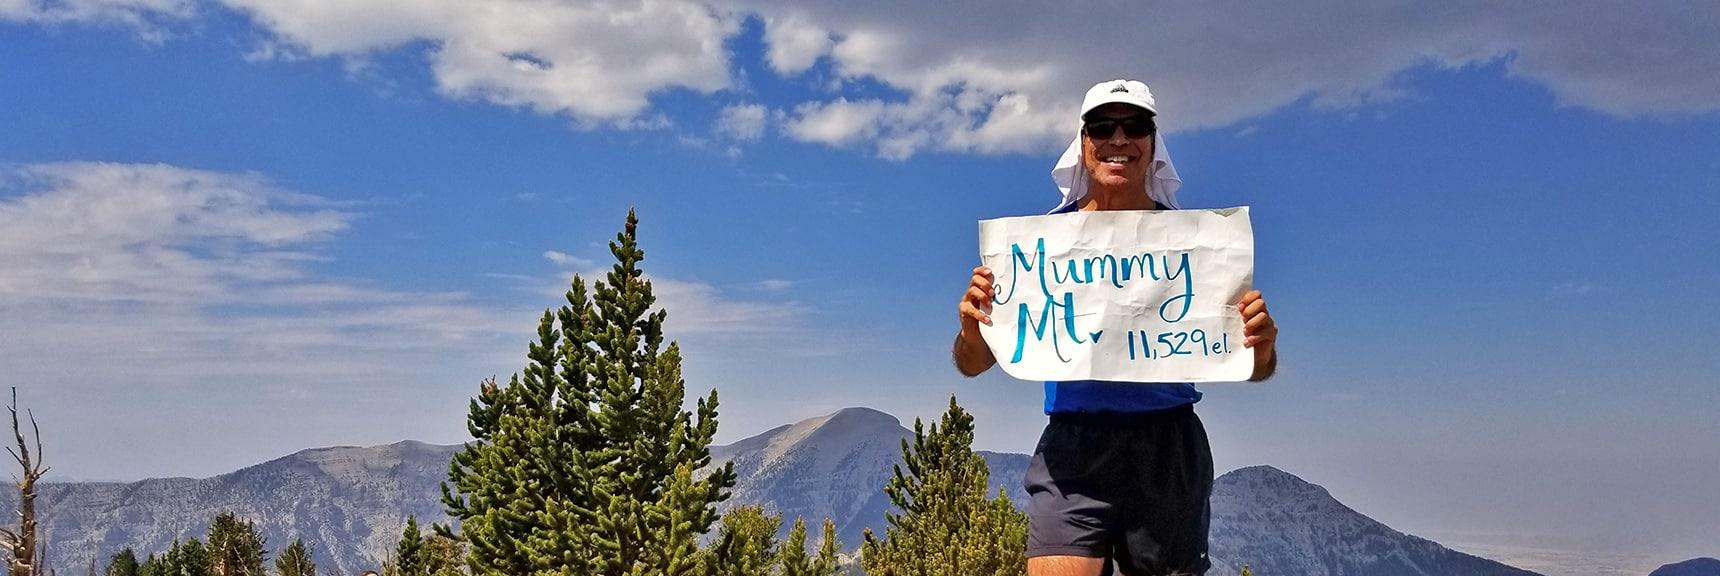 Standing on Mummy Mountain's Summit. Charleston and Lee Peaks in Background. | Mummy Mountain NE Cliffs Descent | Mt Charleston Wilderness | Spring Mountains, Nevada